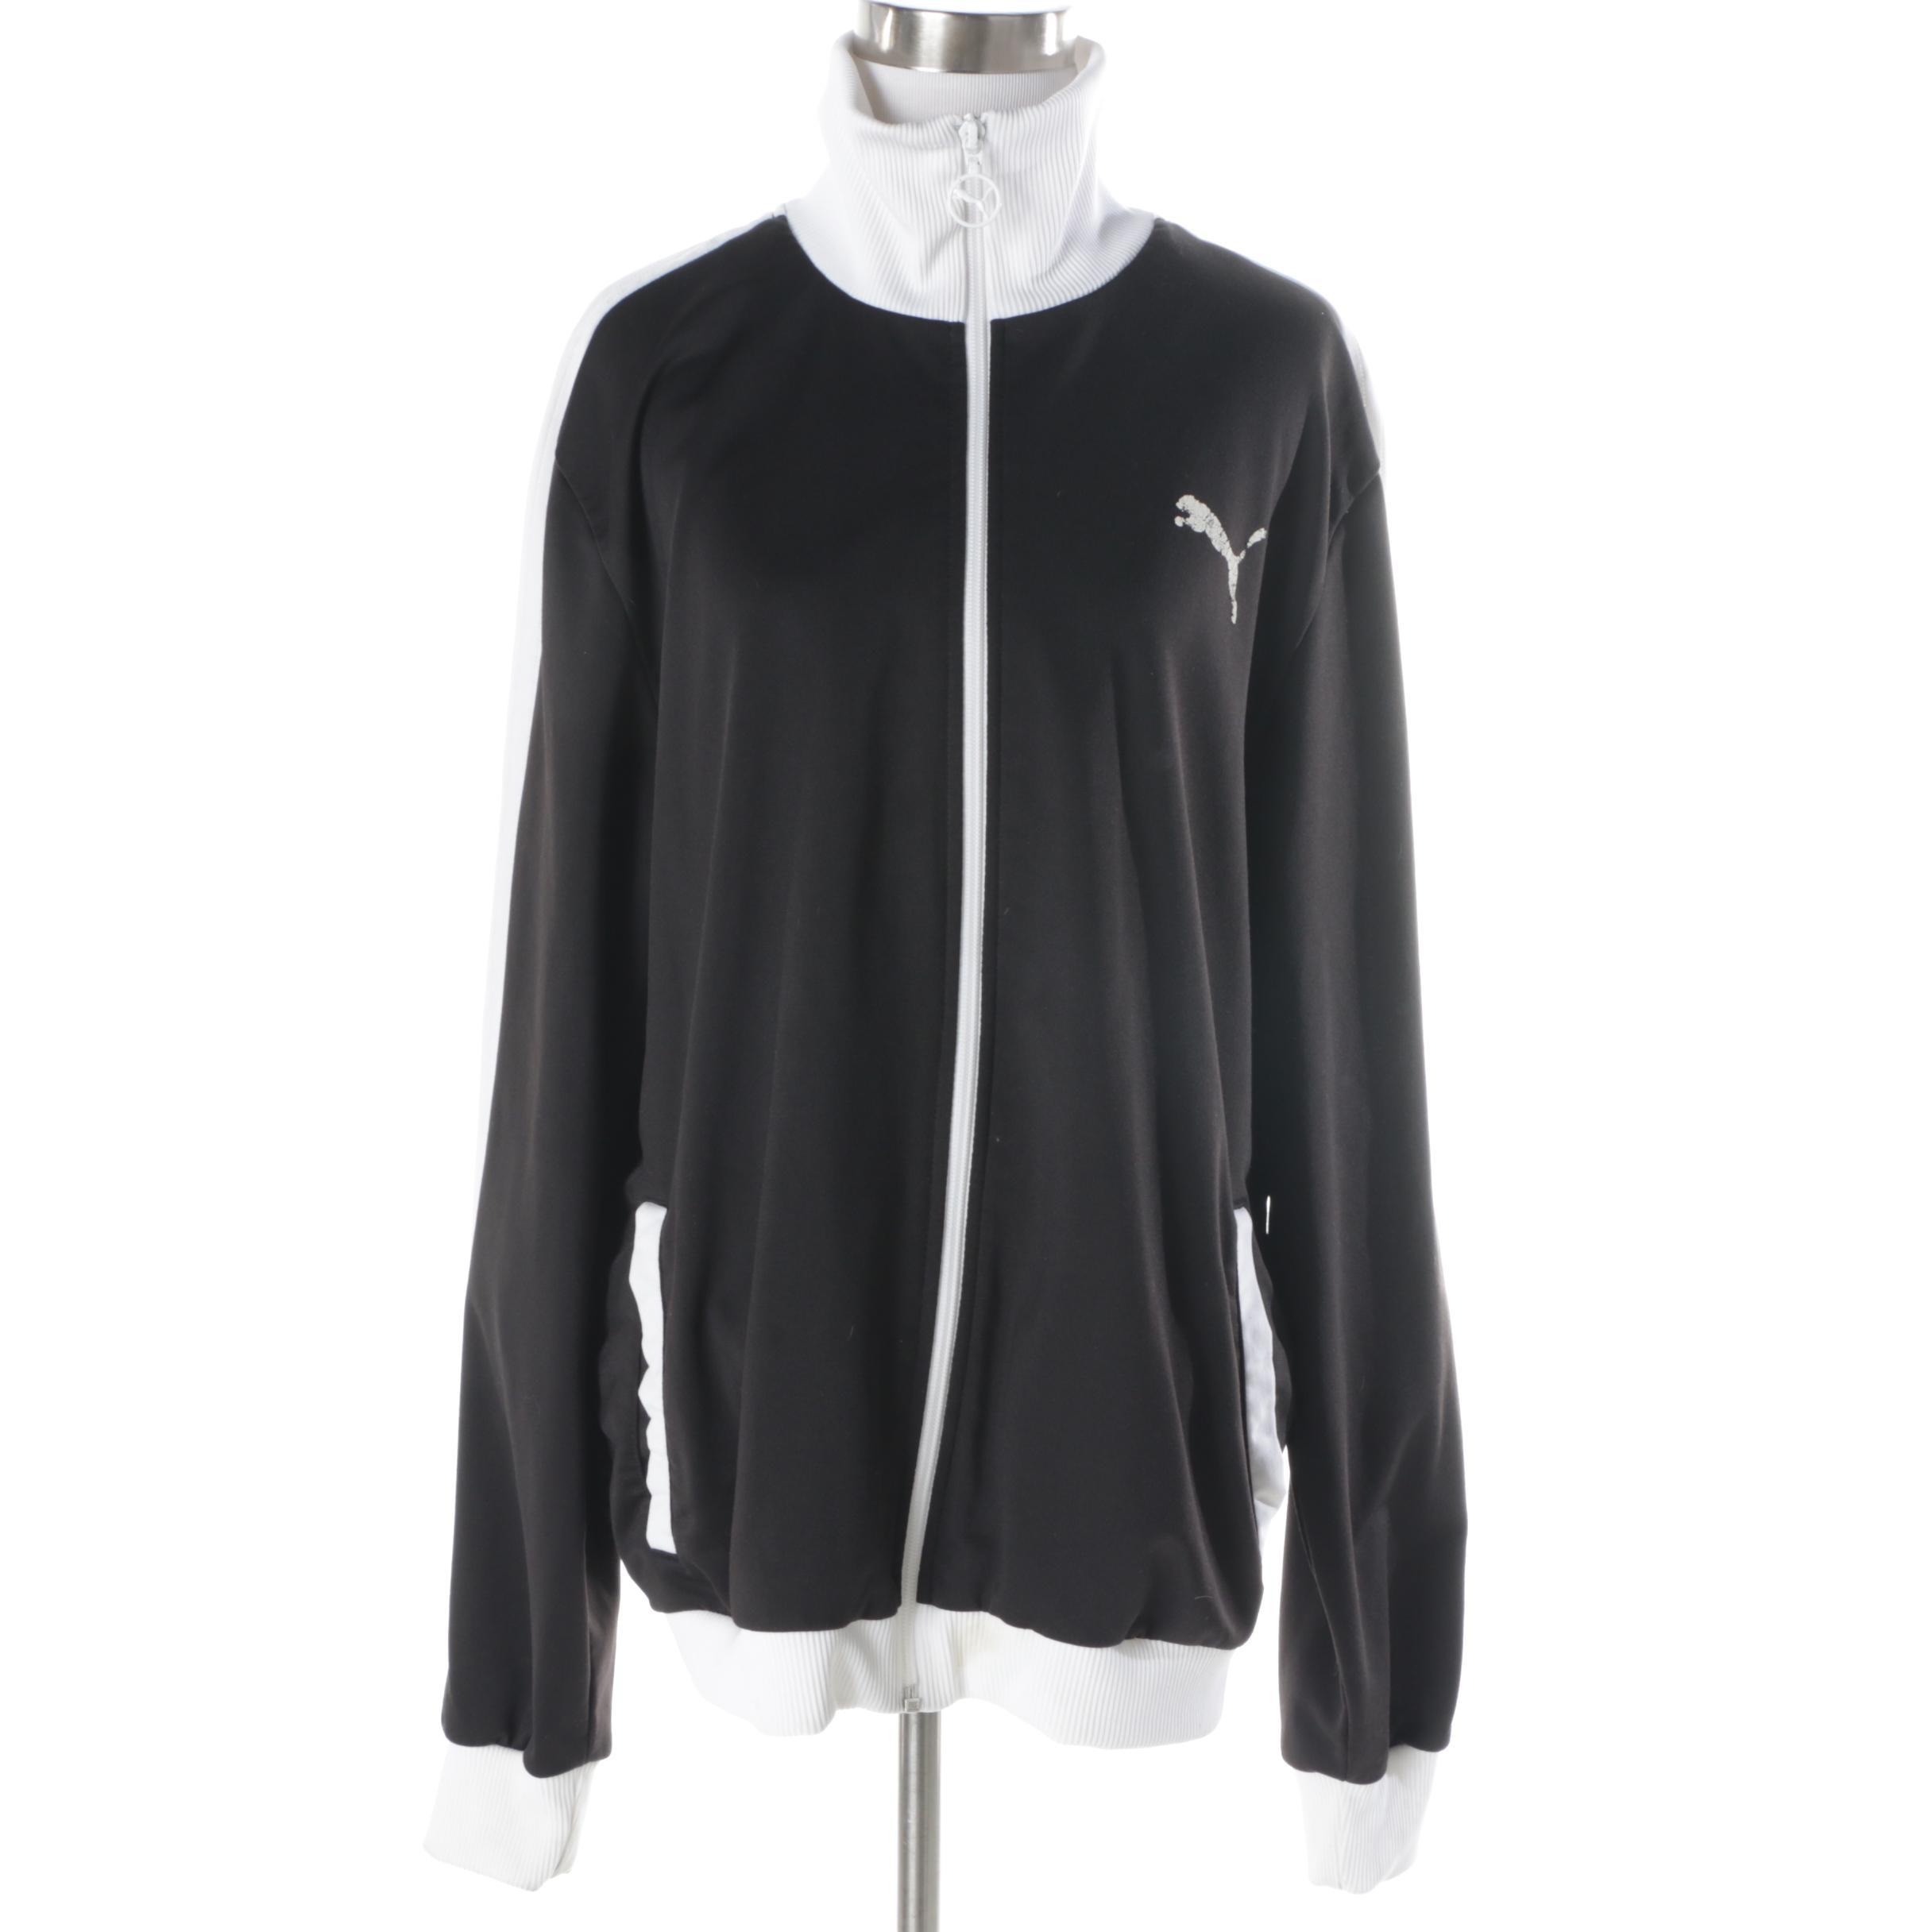 Women's Puma Jacket